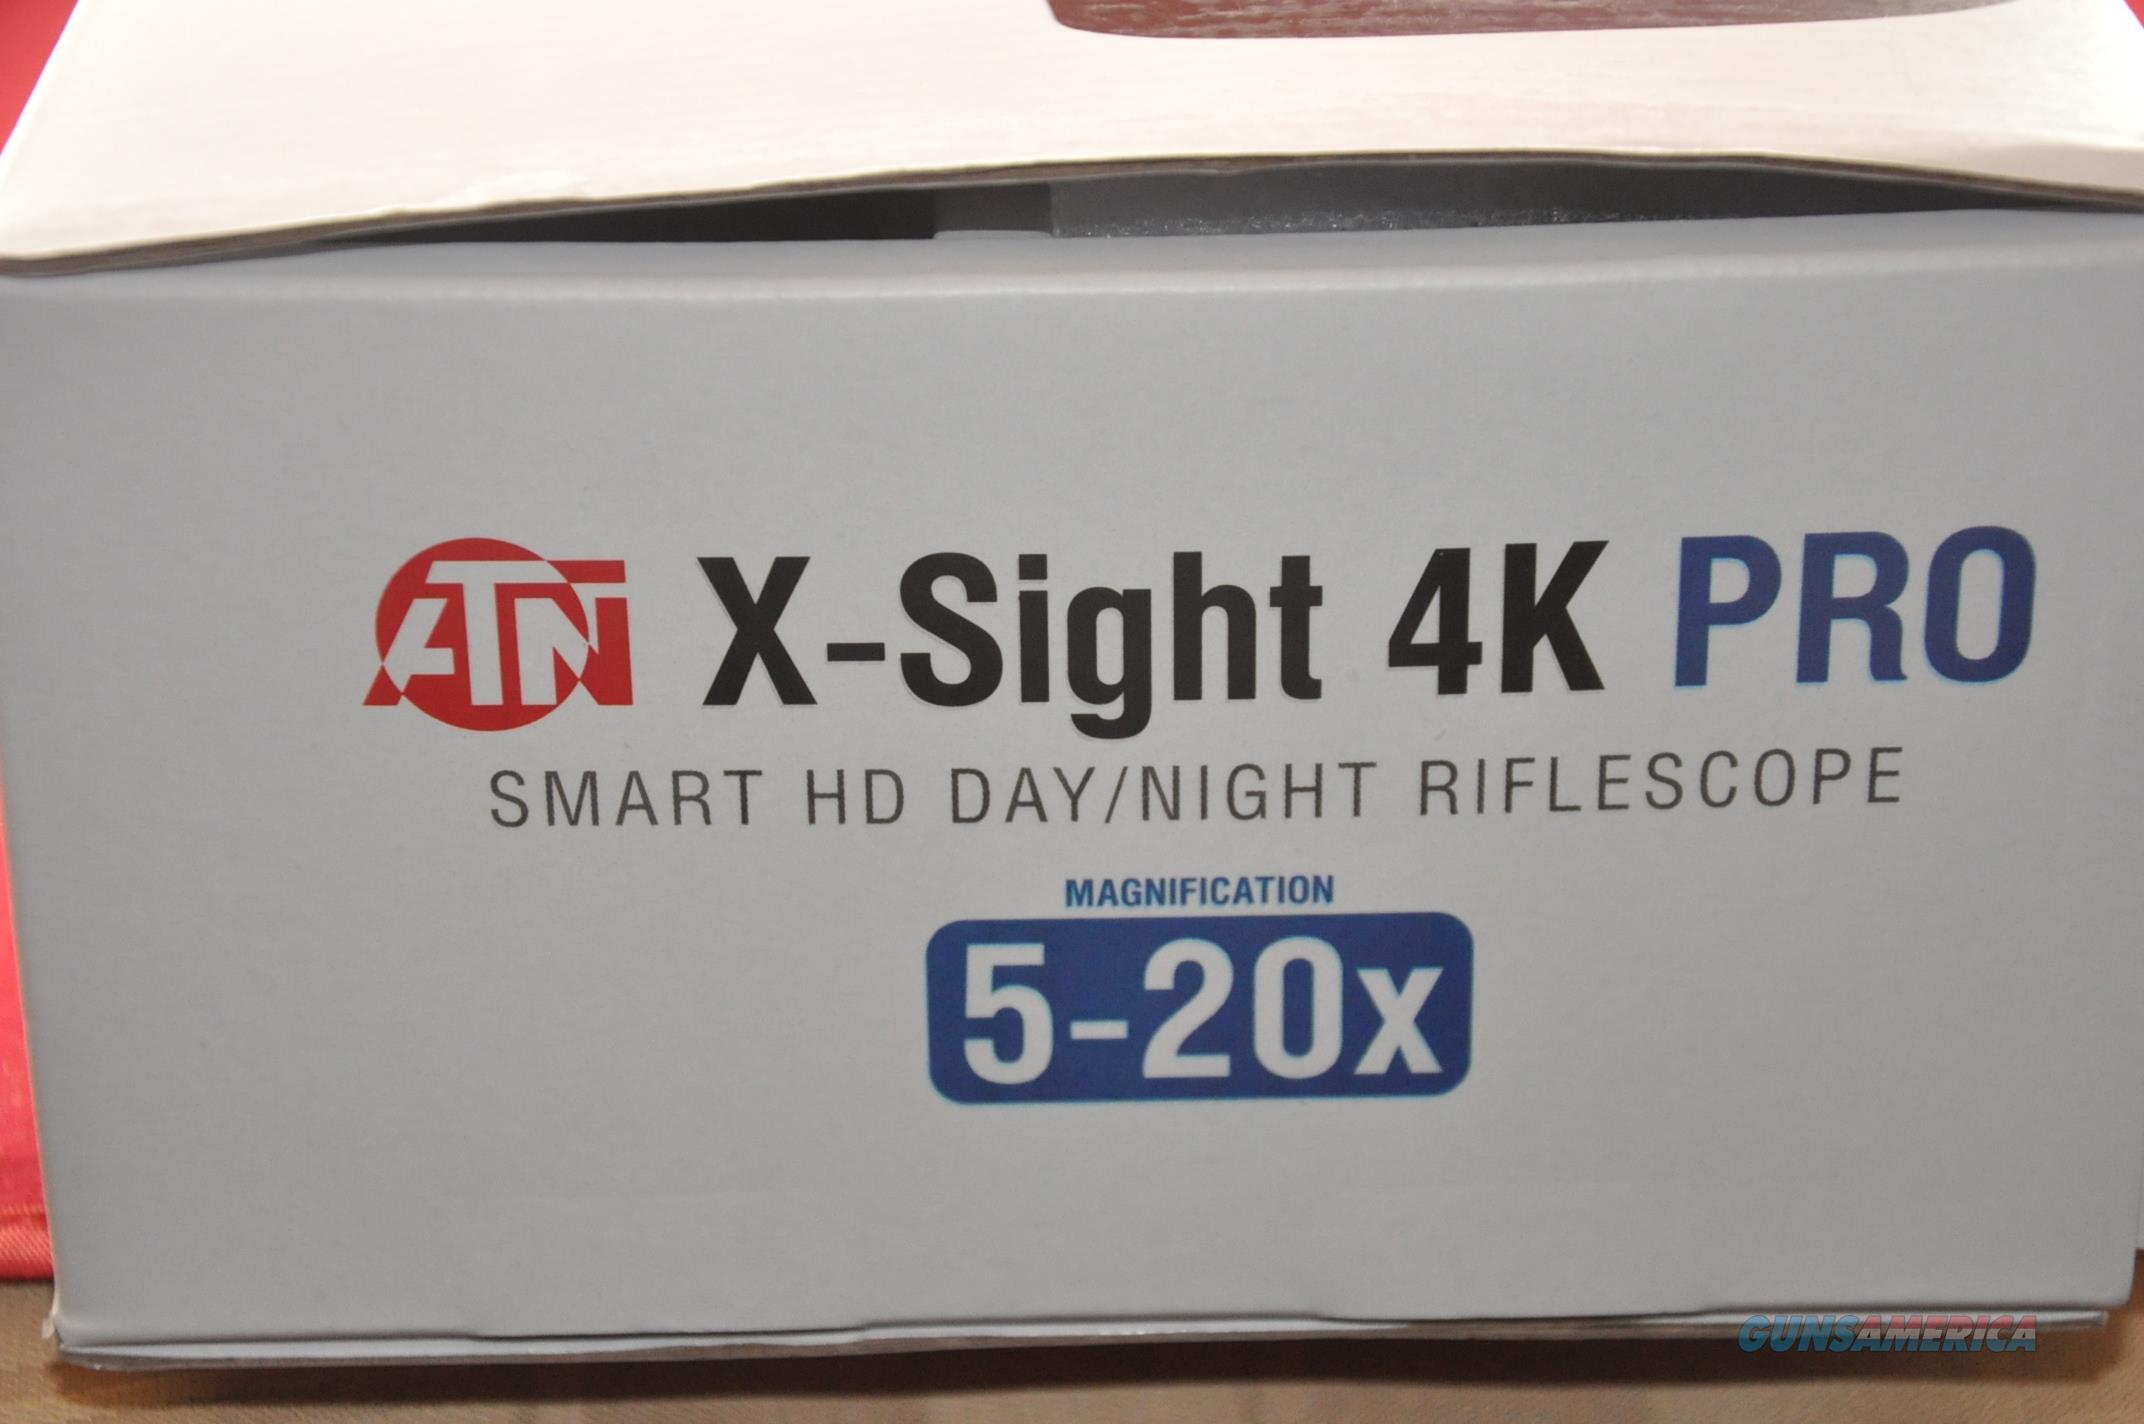 ATN X-Sight 4K Pro Smart Ultra HD 5-20x Smart Day/Night Rifle Scope  DGWSXS5204KP